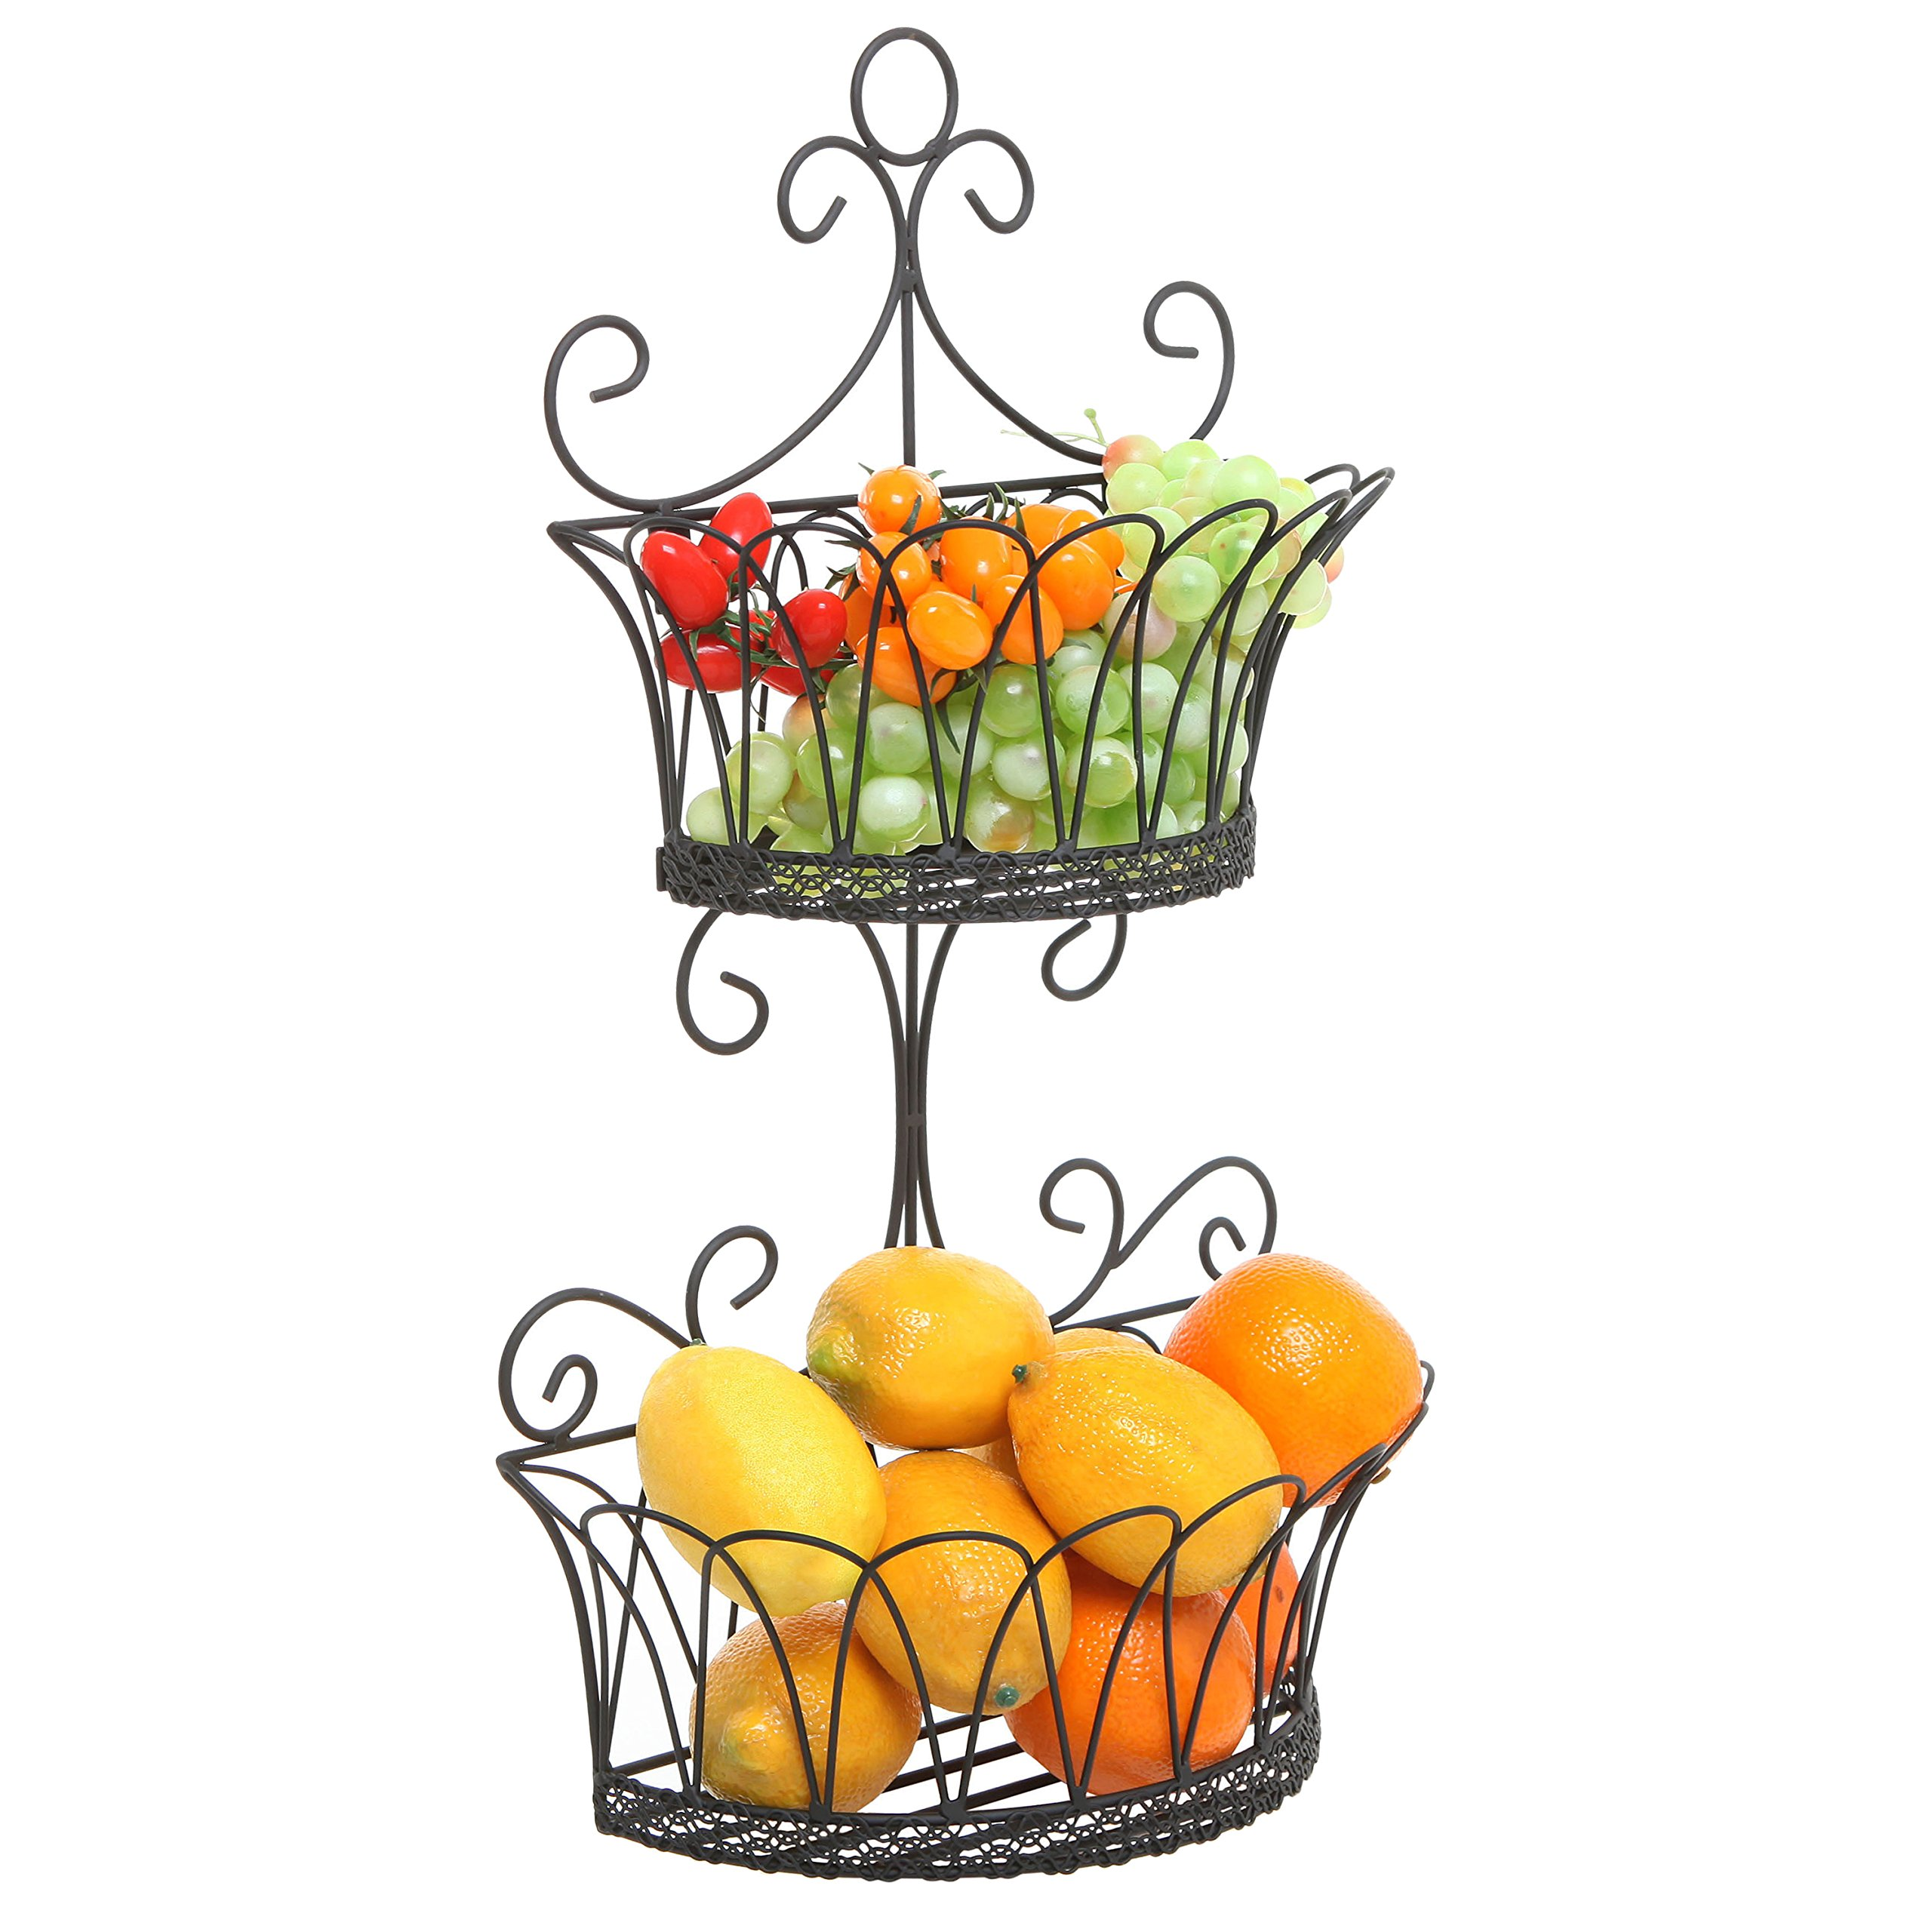 Wall Mounted Scrollwork 3 Tier Black Iron Fruit Basket//Kitchen Storage Rack